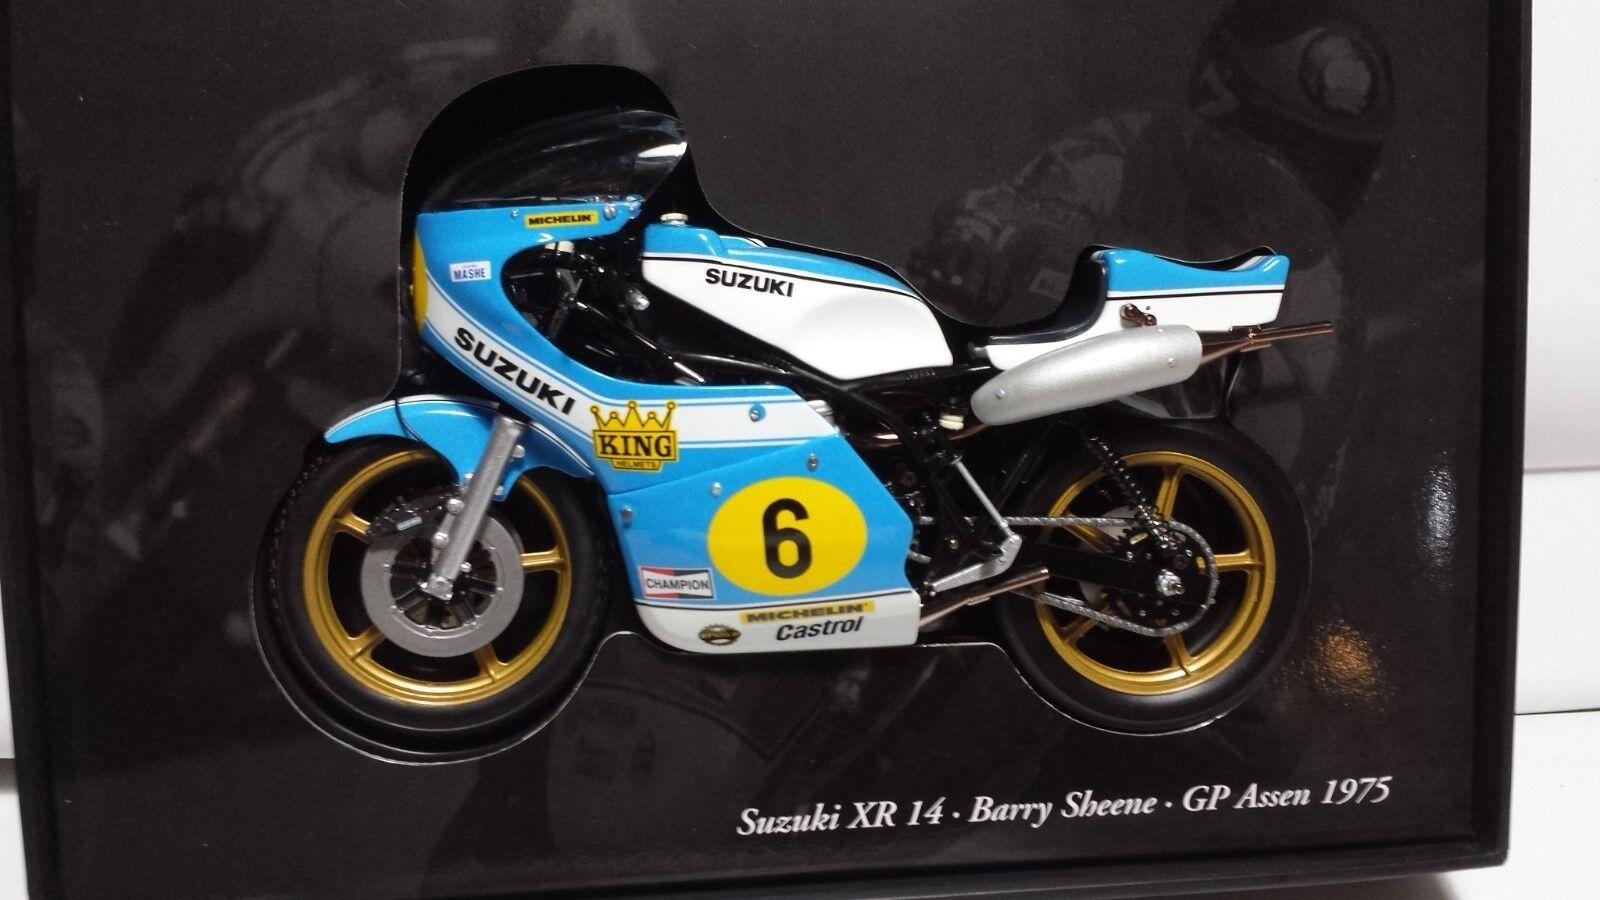 elige tu favorito Barry Barry Barry Sheene. Suzuki XR14. GP ASSEN 1975. Minichamps 1 12.  El nuevo outlet de marcas online.